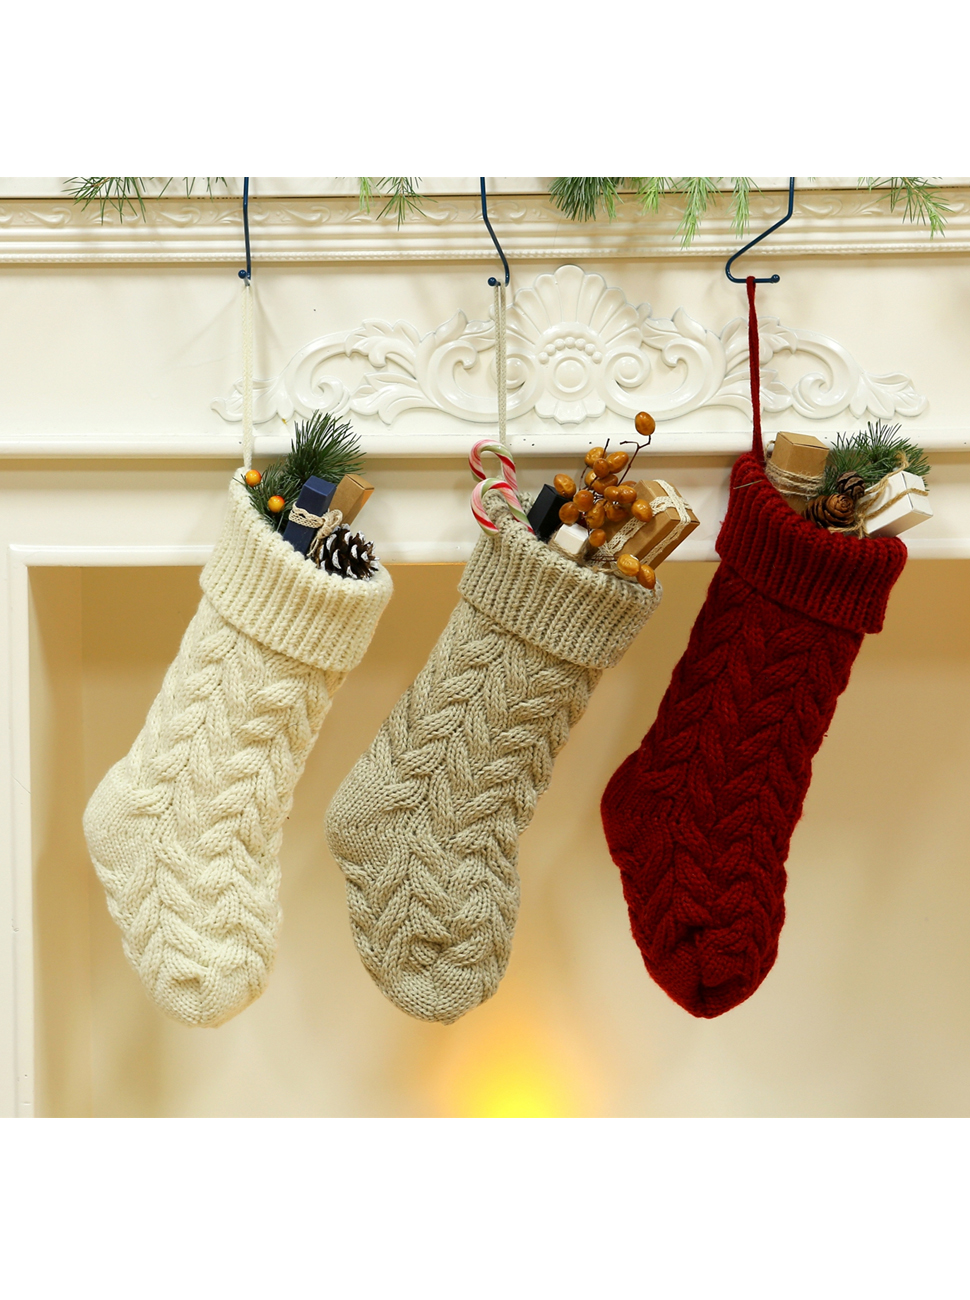 Amazon.com: SherryDC Crochet Cable Knit Christmas Stockings 15 ...